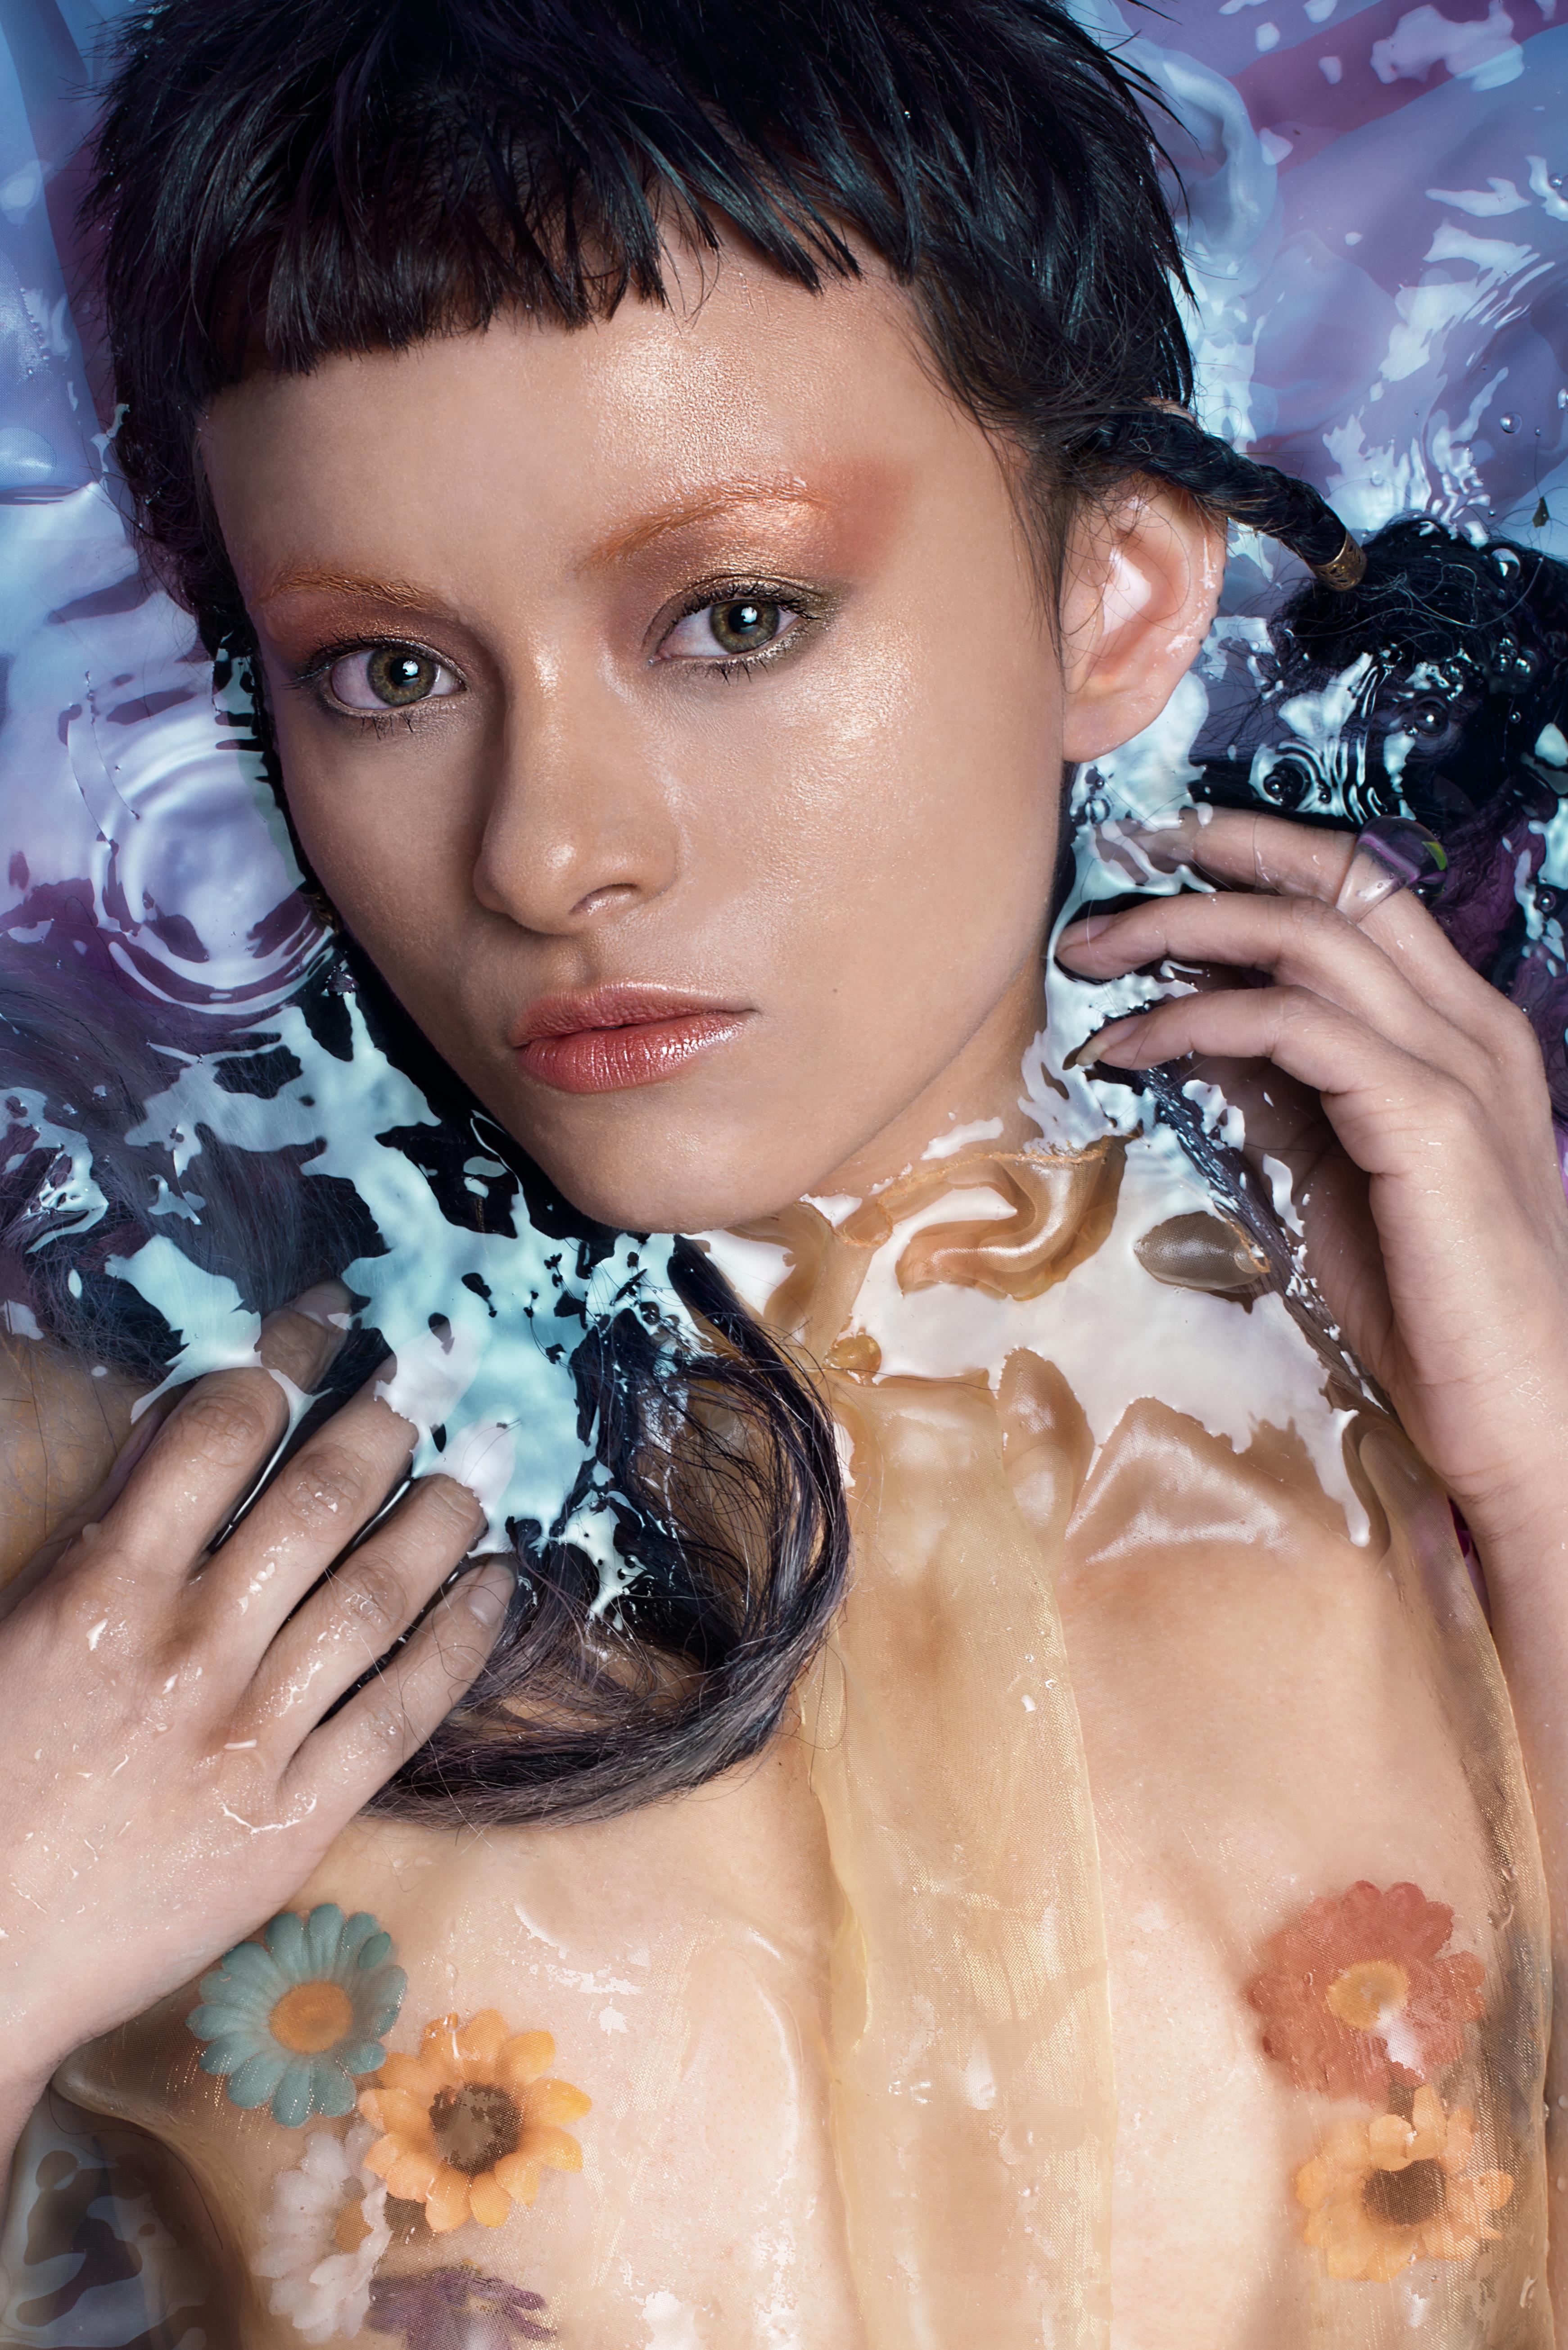 03_noche_makeup_galves_cubillos_lisbeth_final_01